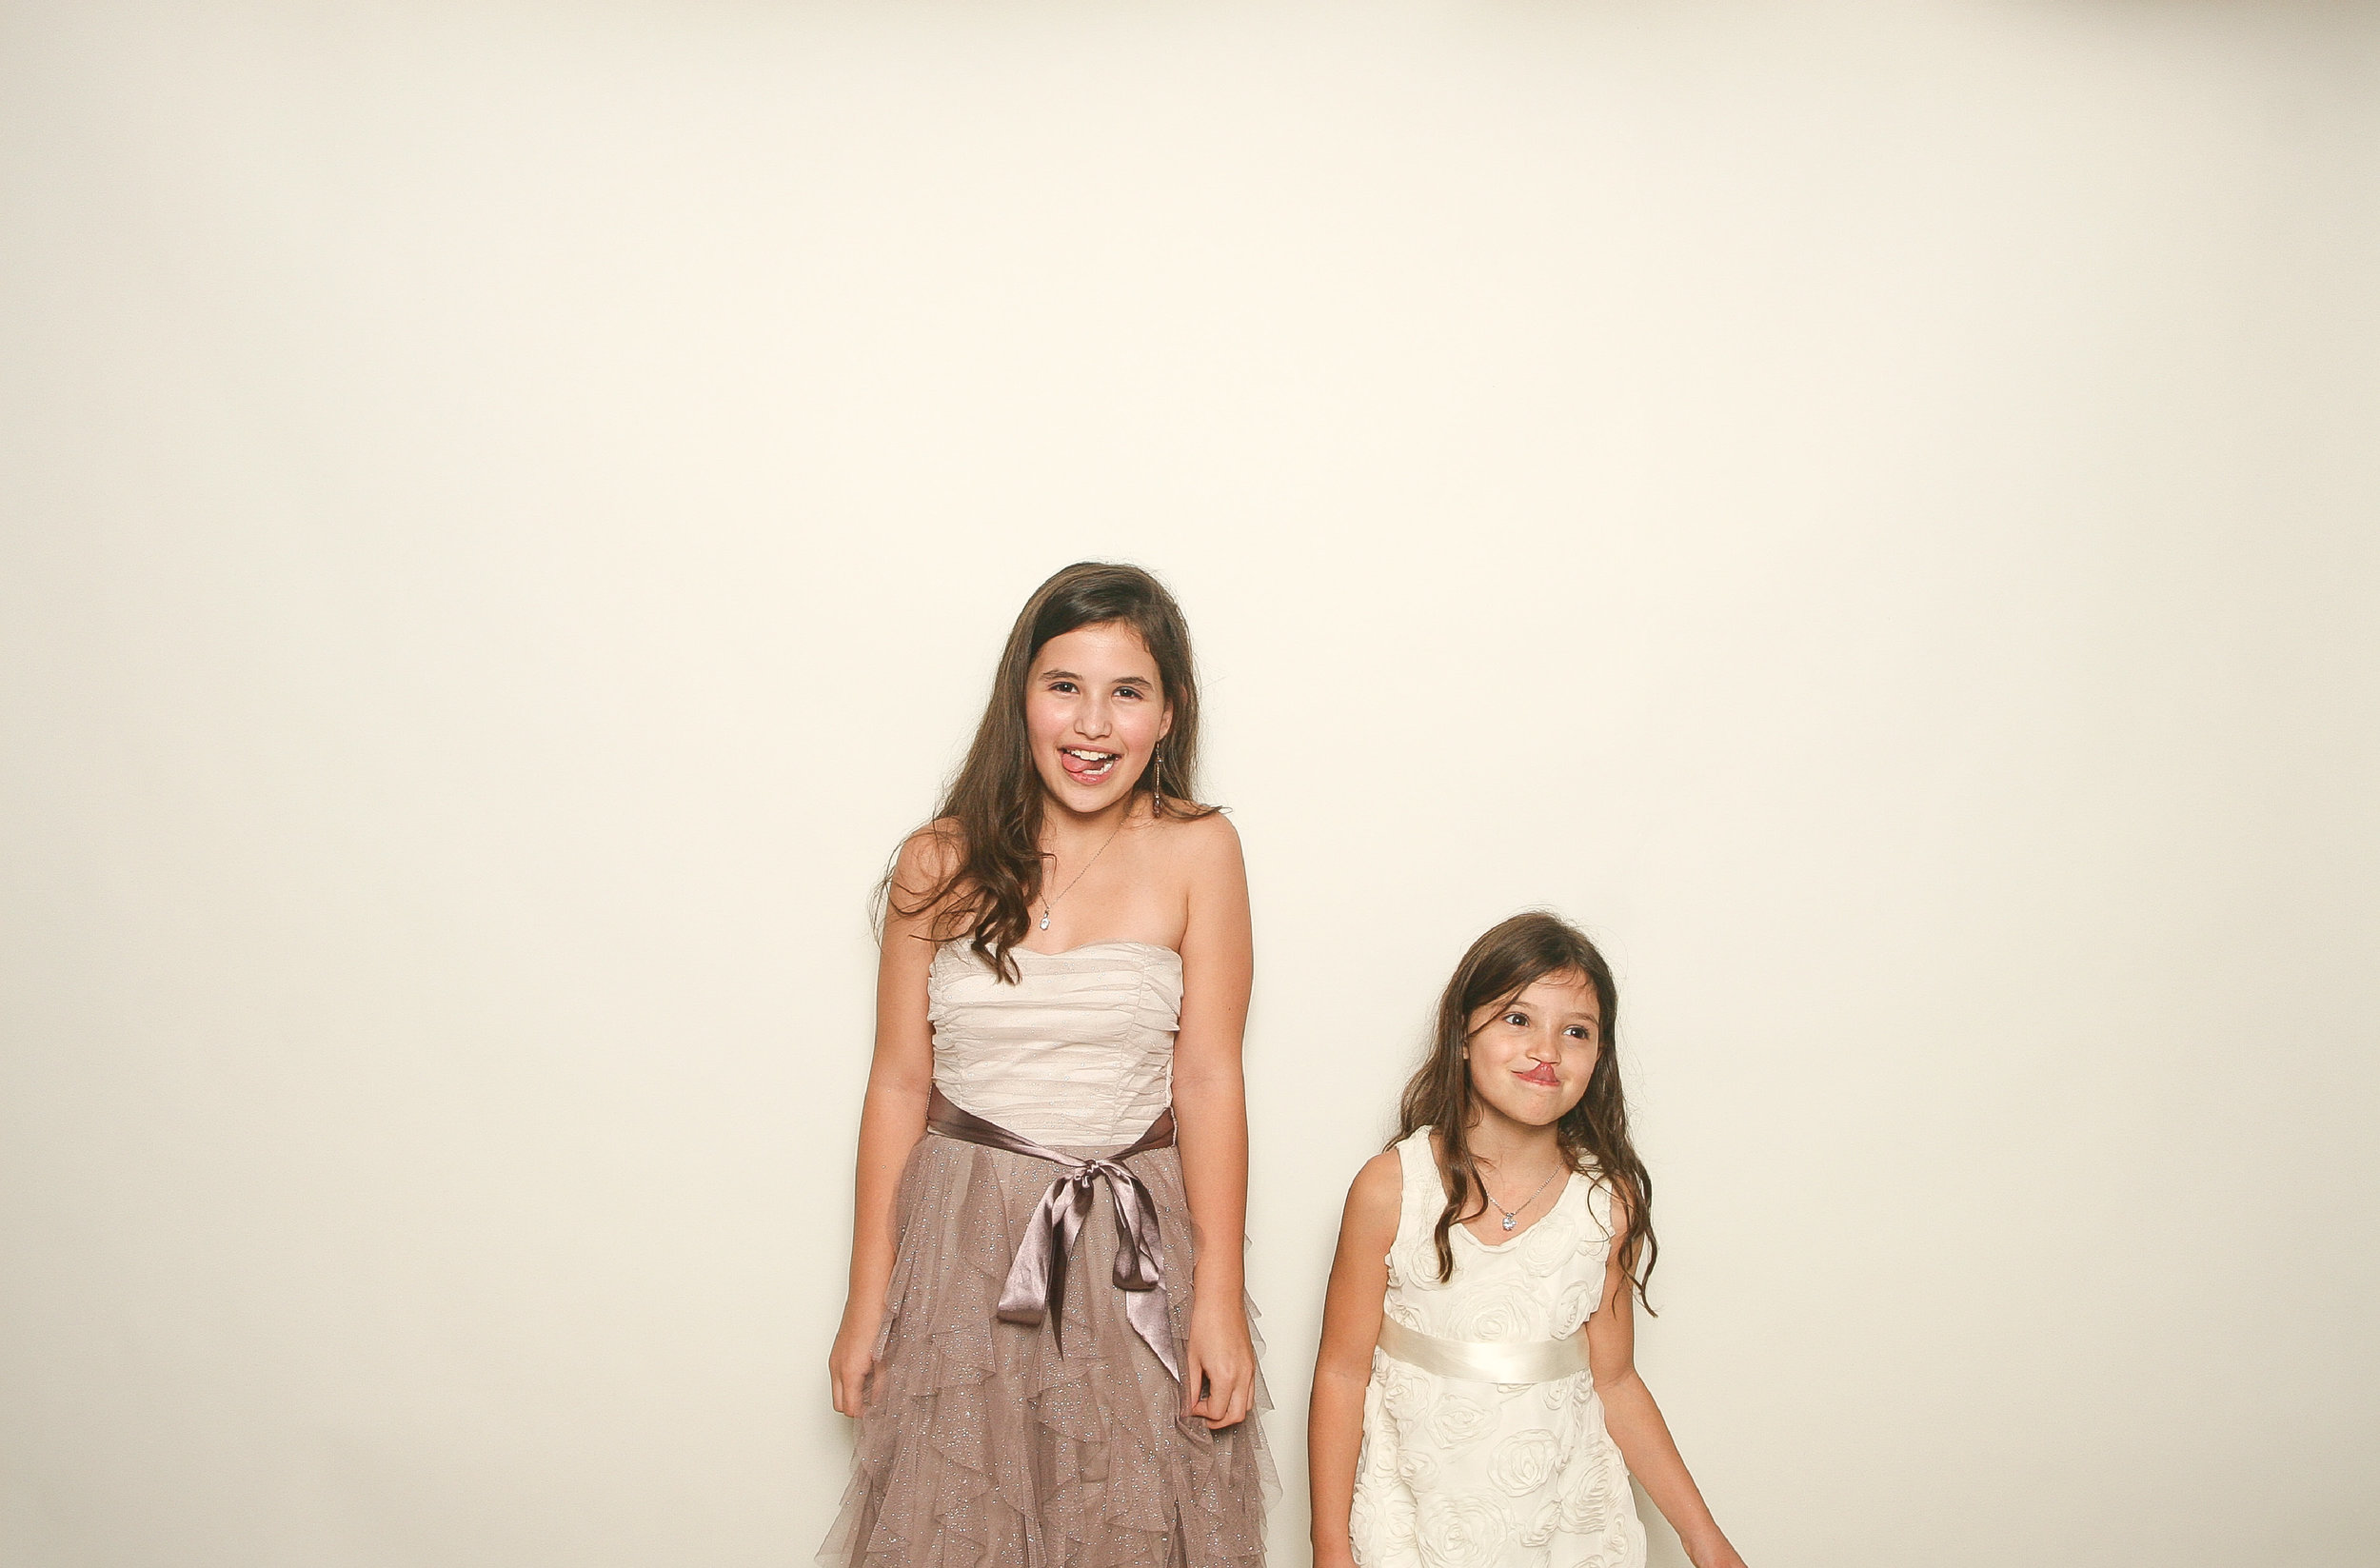 South Florida Miami Wedding Photobooth28.jpg